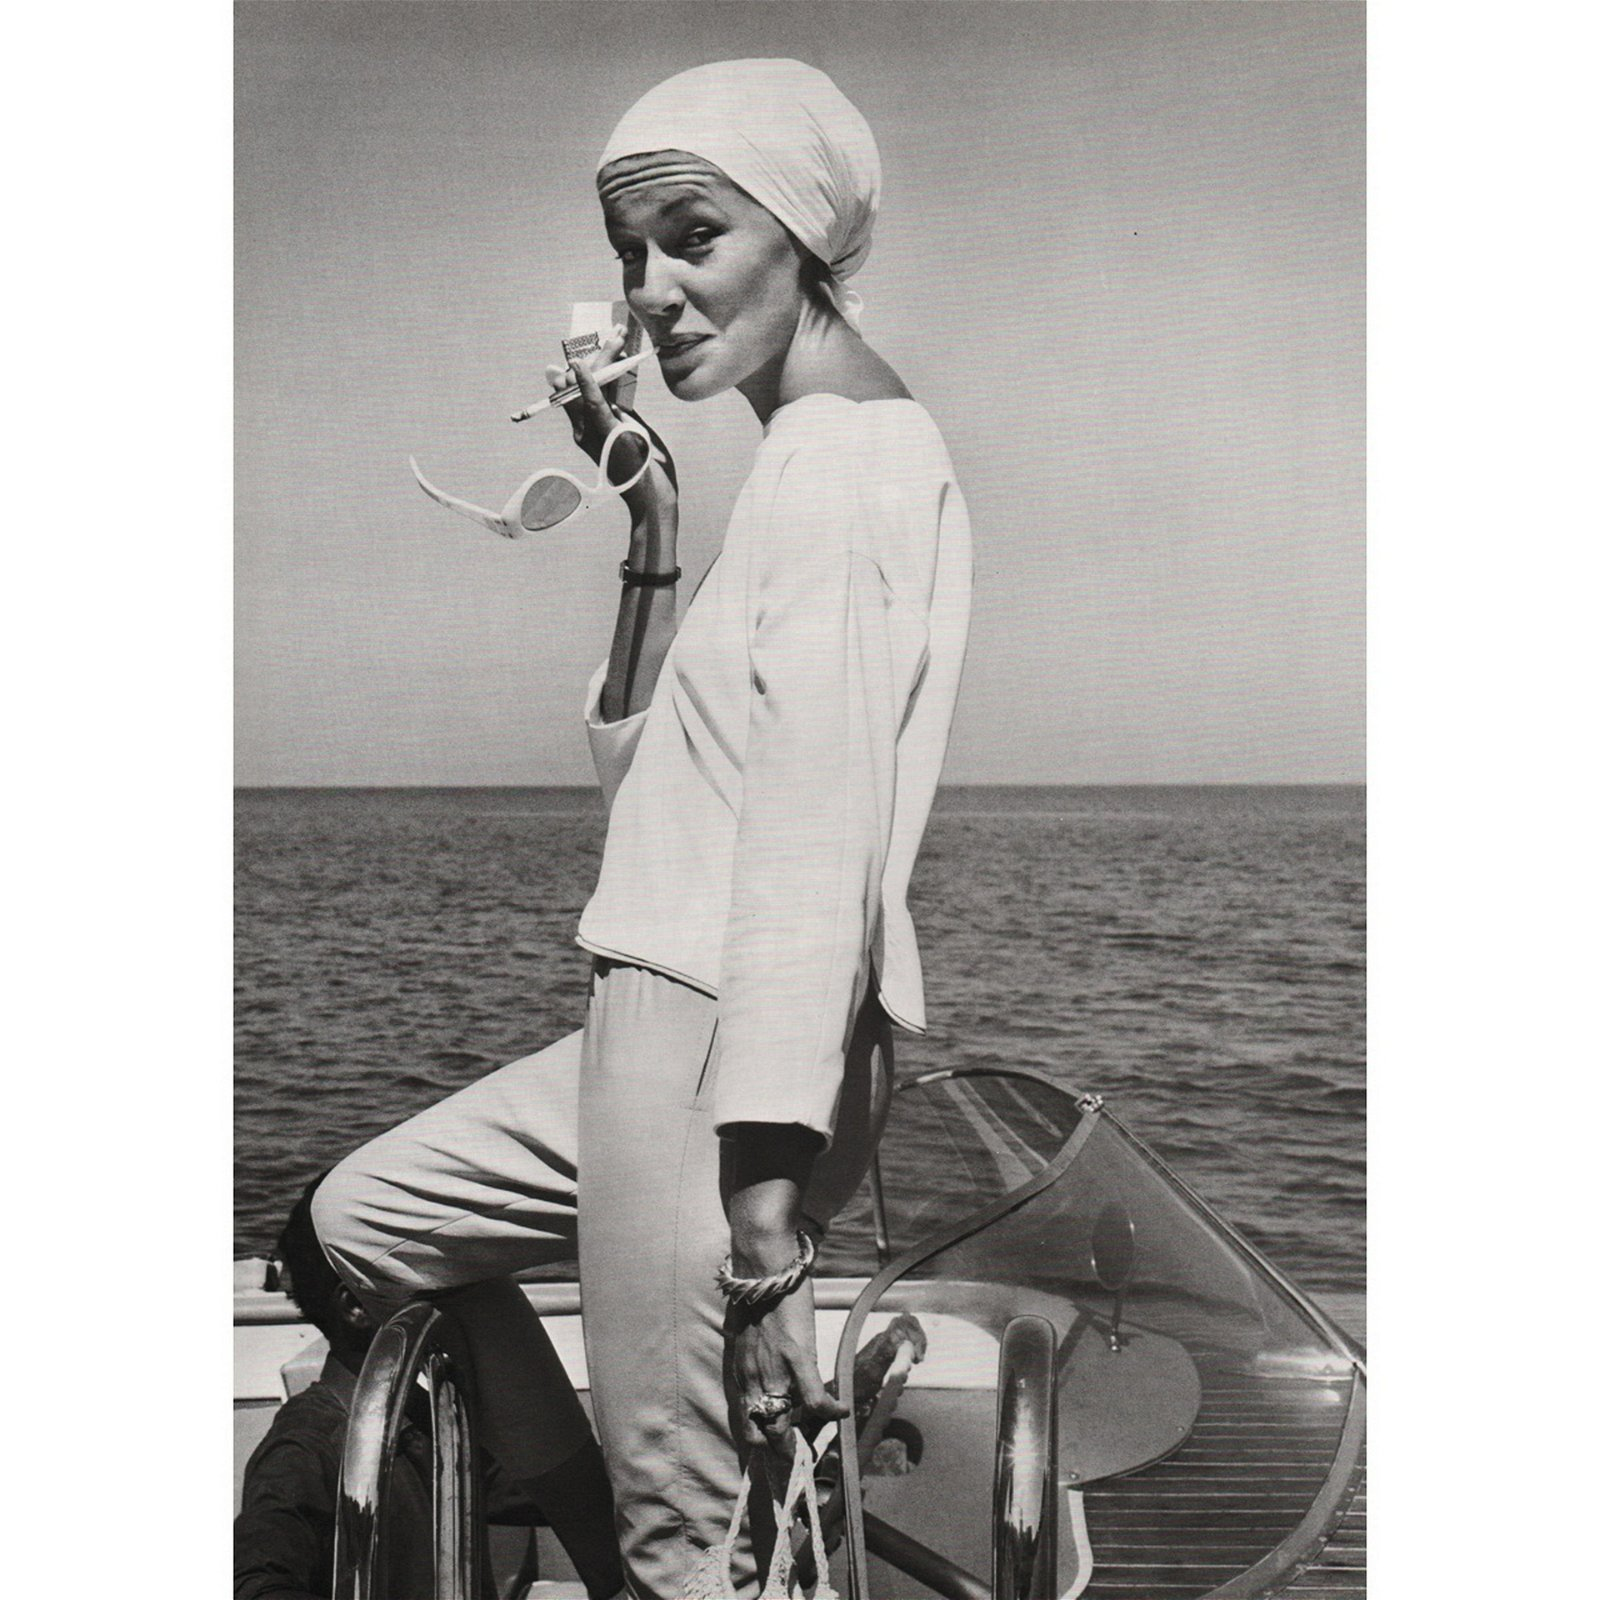 RICHARD AVEDON - Liz Pringle, Jamaica 1959